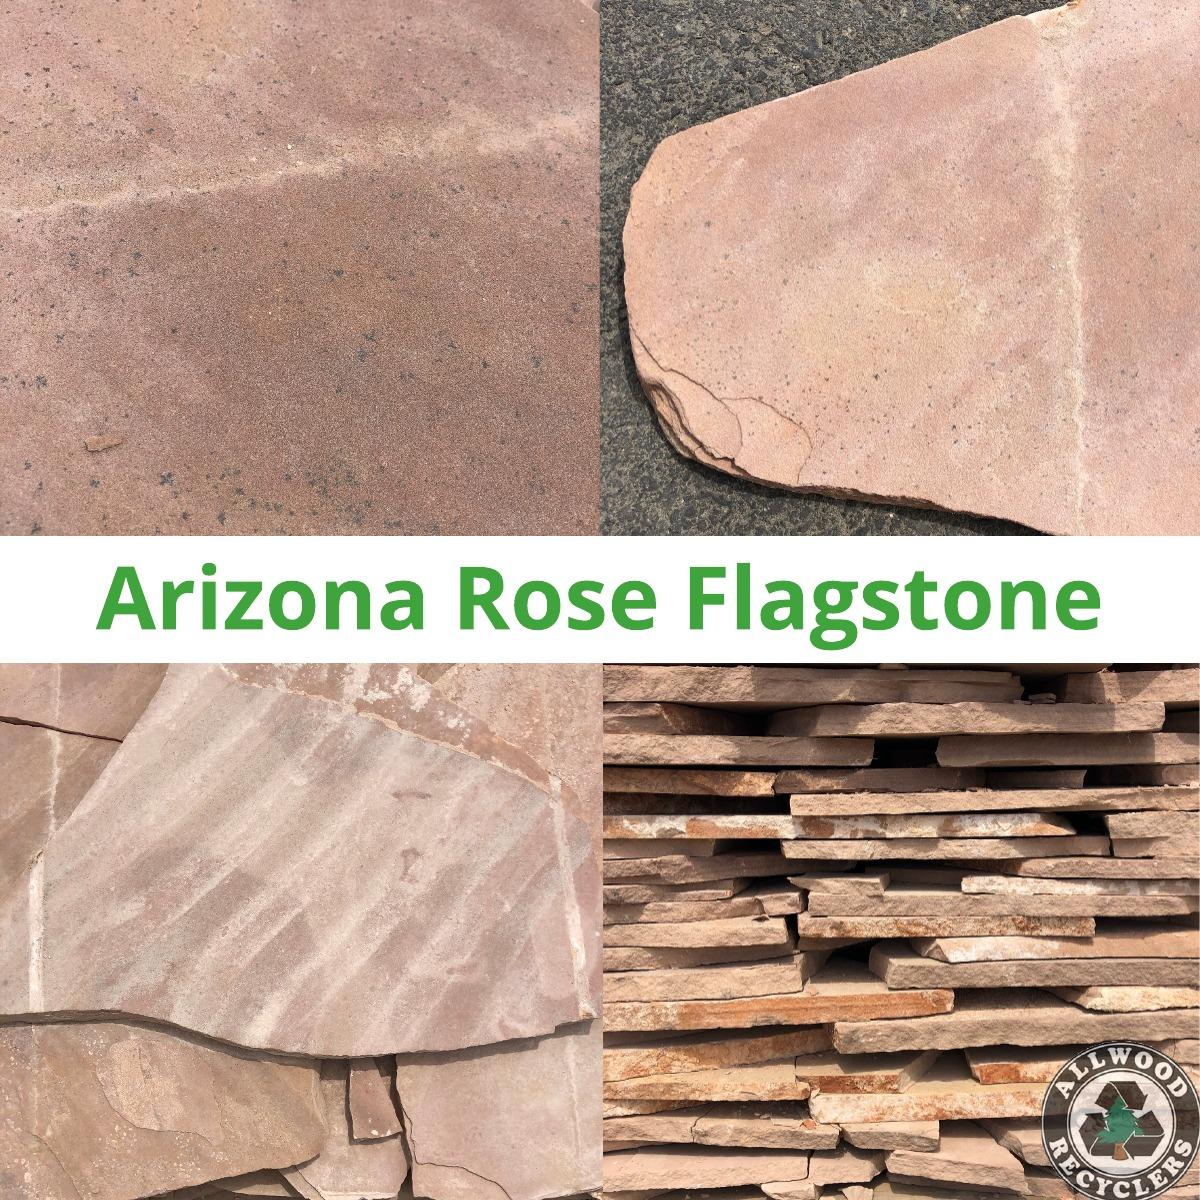 Arizona Rose Flagstone